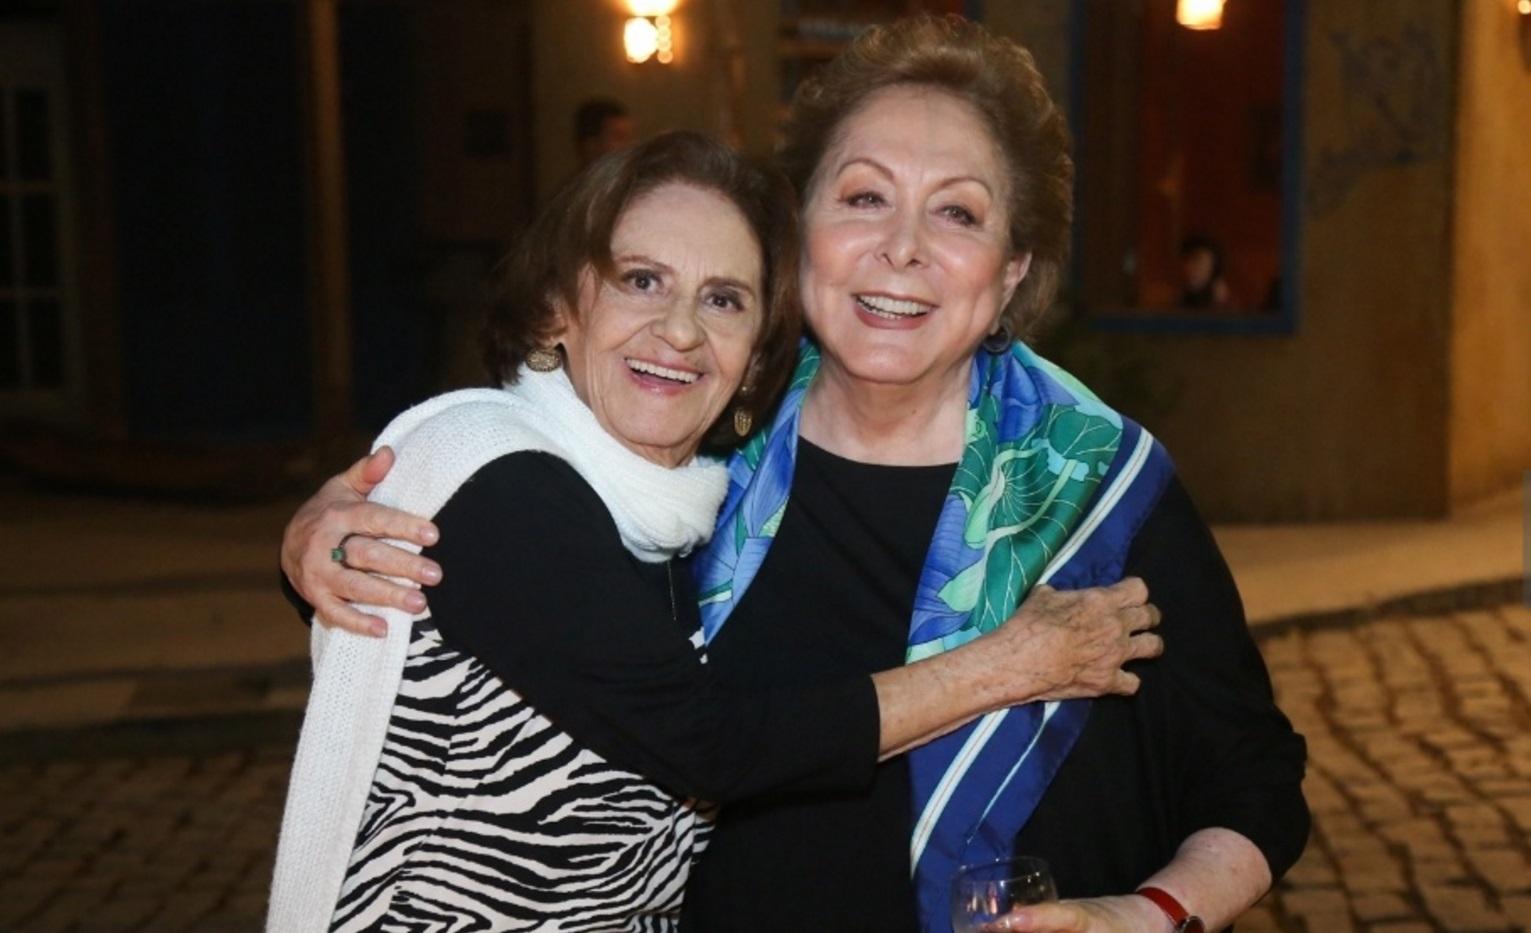 Aracy Balabanian Stunning 13 de setembro – laura cardoso – 1927 – 90 anos em 2017